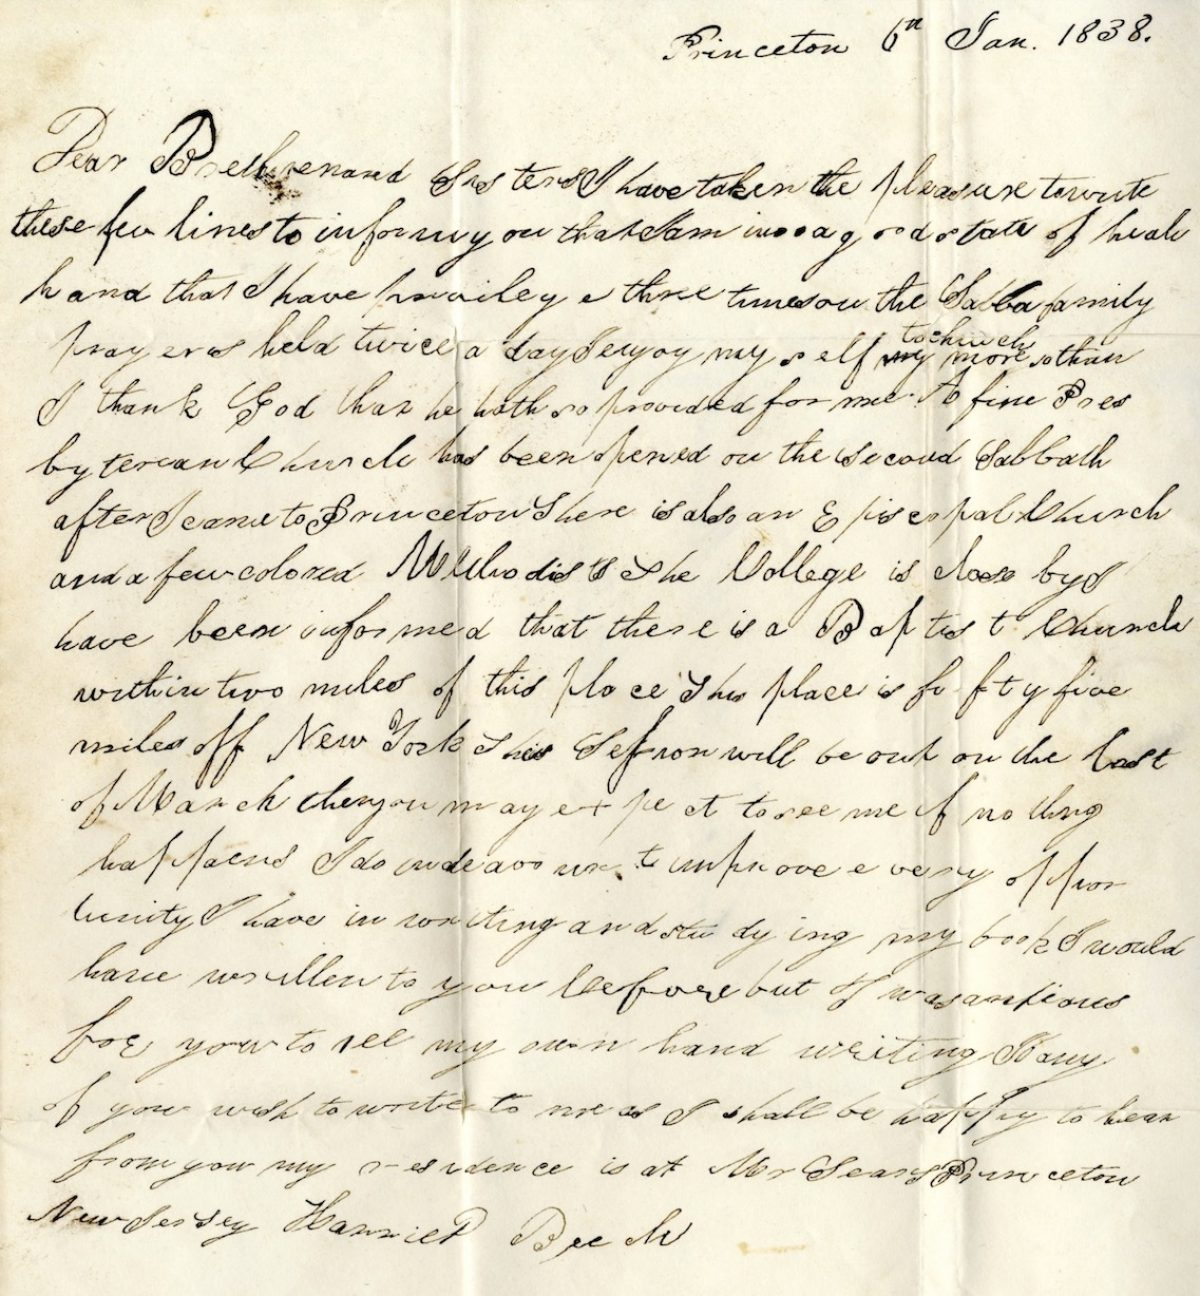 Letter from Harriet Beech